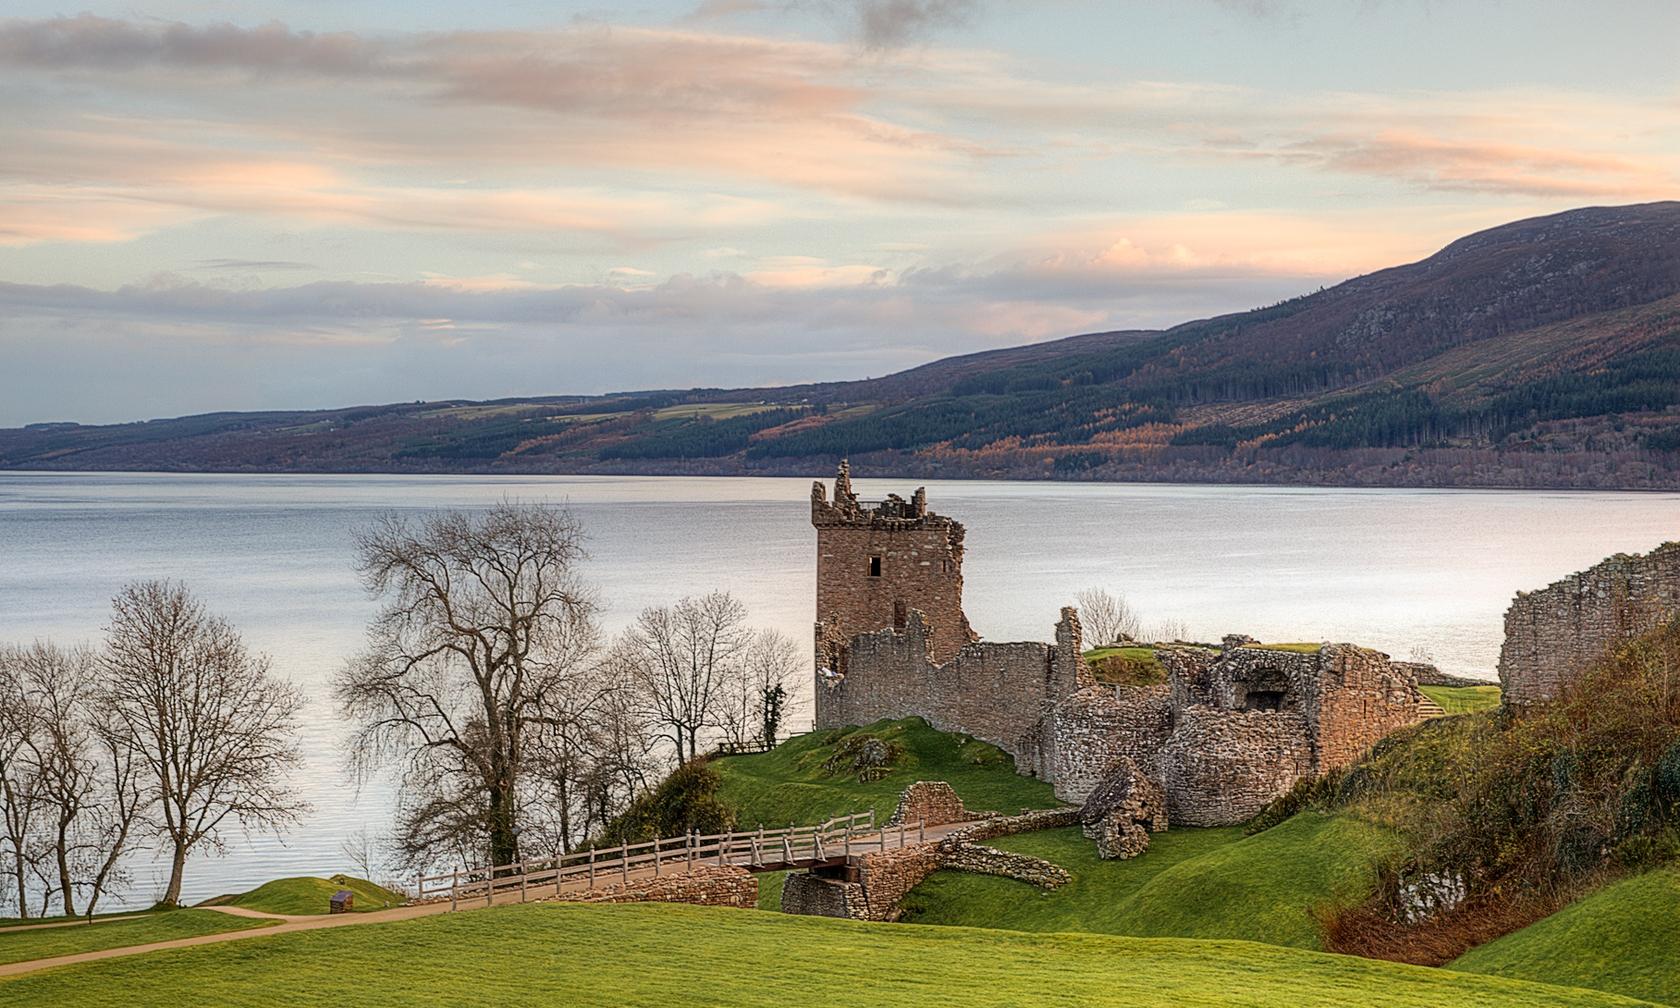 Holiday rentals in Loch Ness